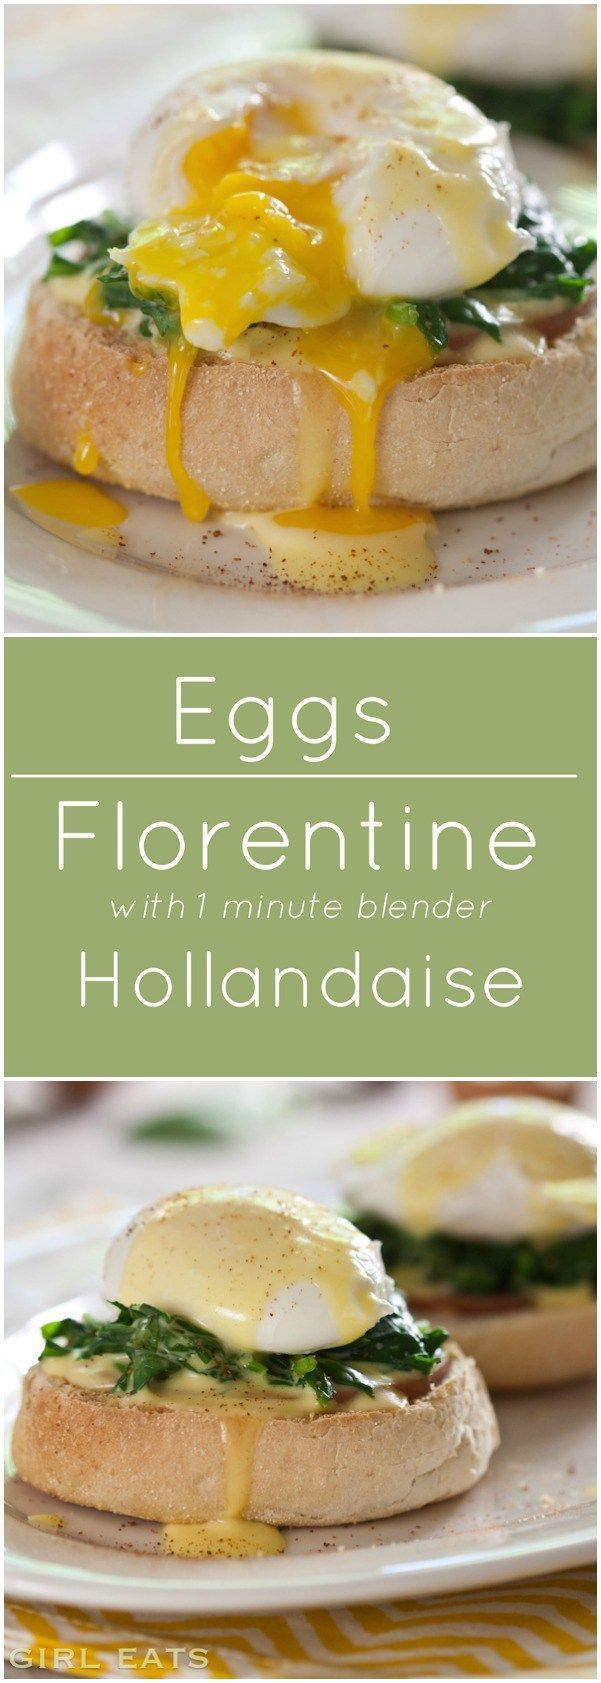 Eggs Florentine with 1 minute blender Hollandaise.